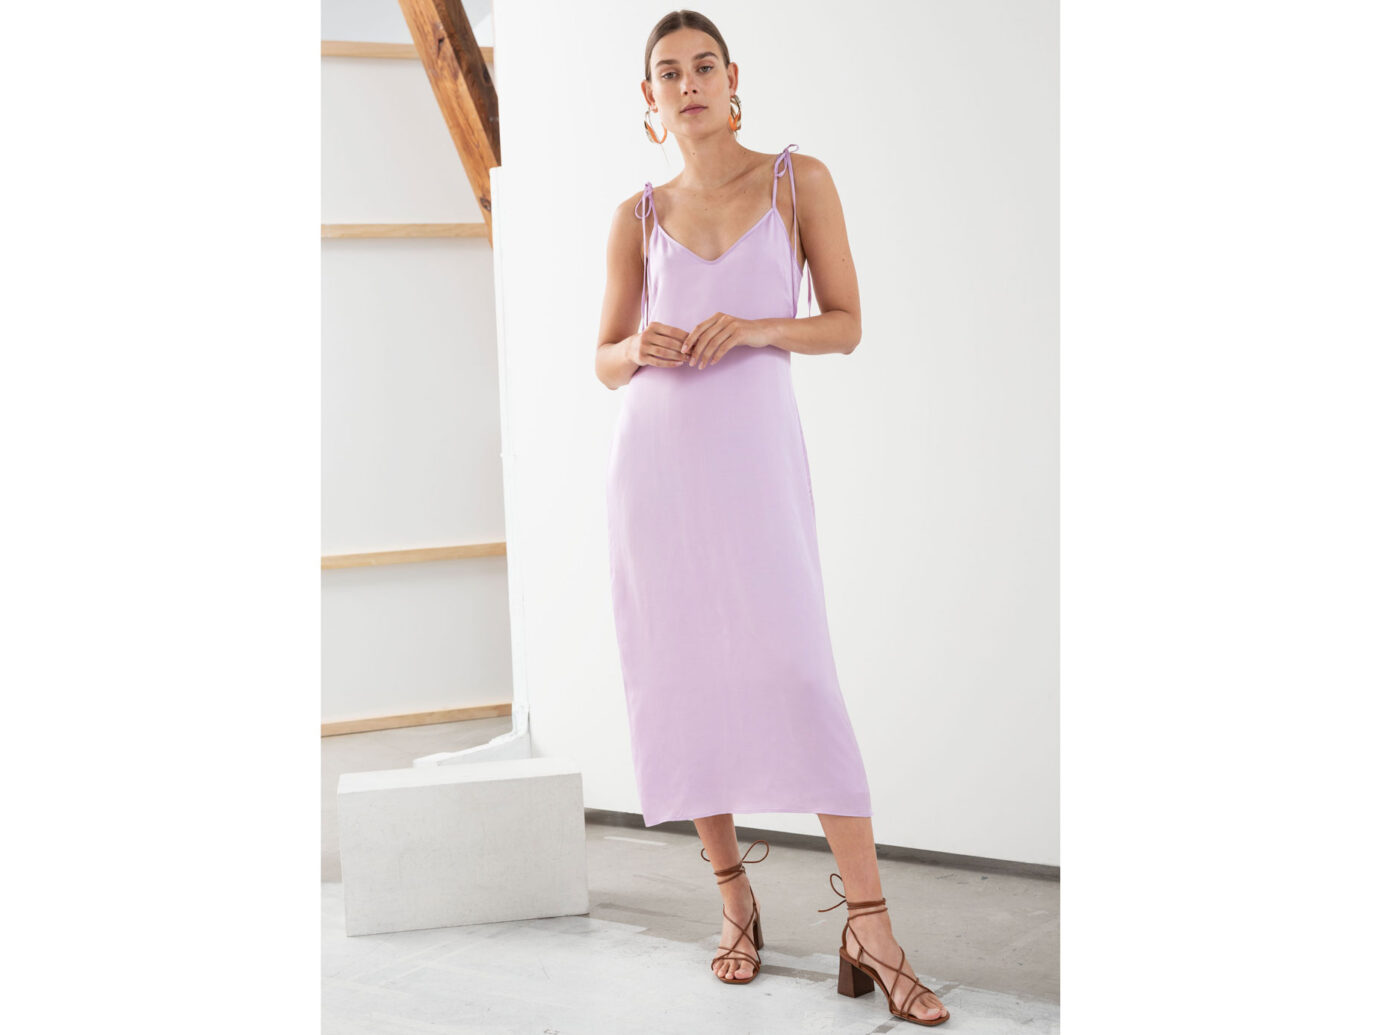 & Other Stories Shoulder Tie Midi Slip Dress